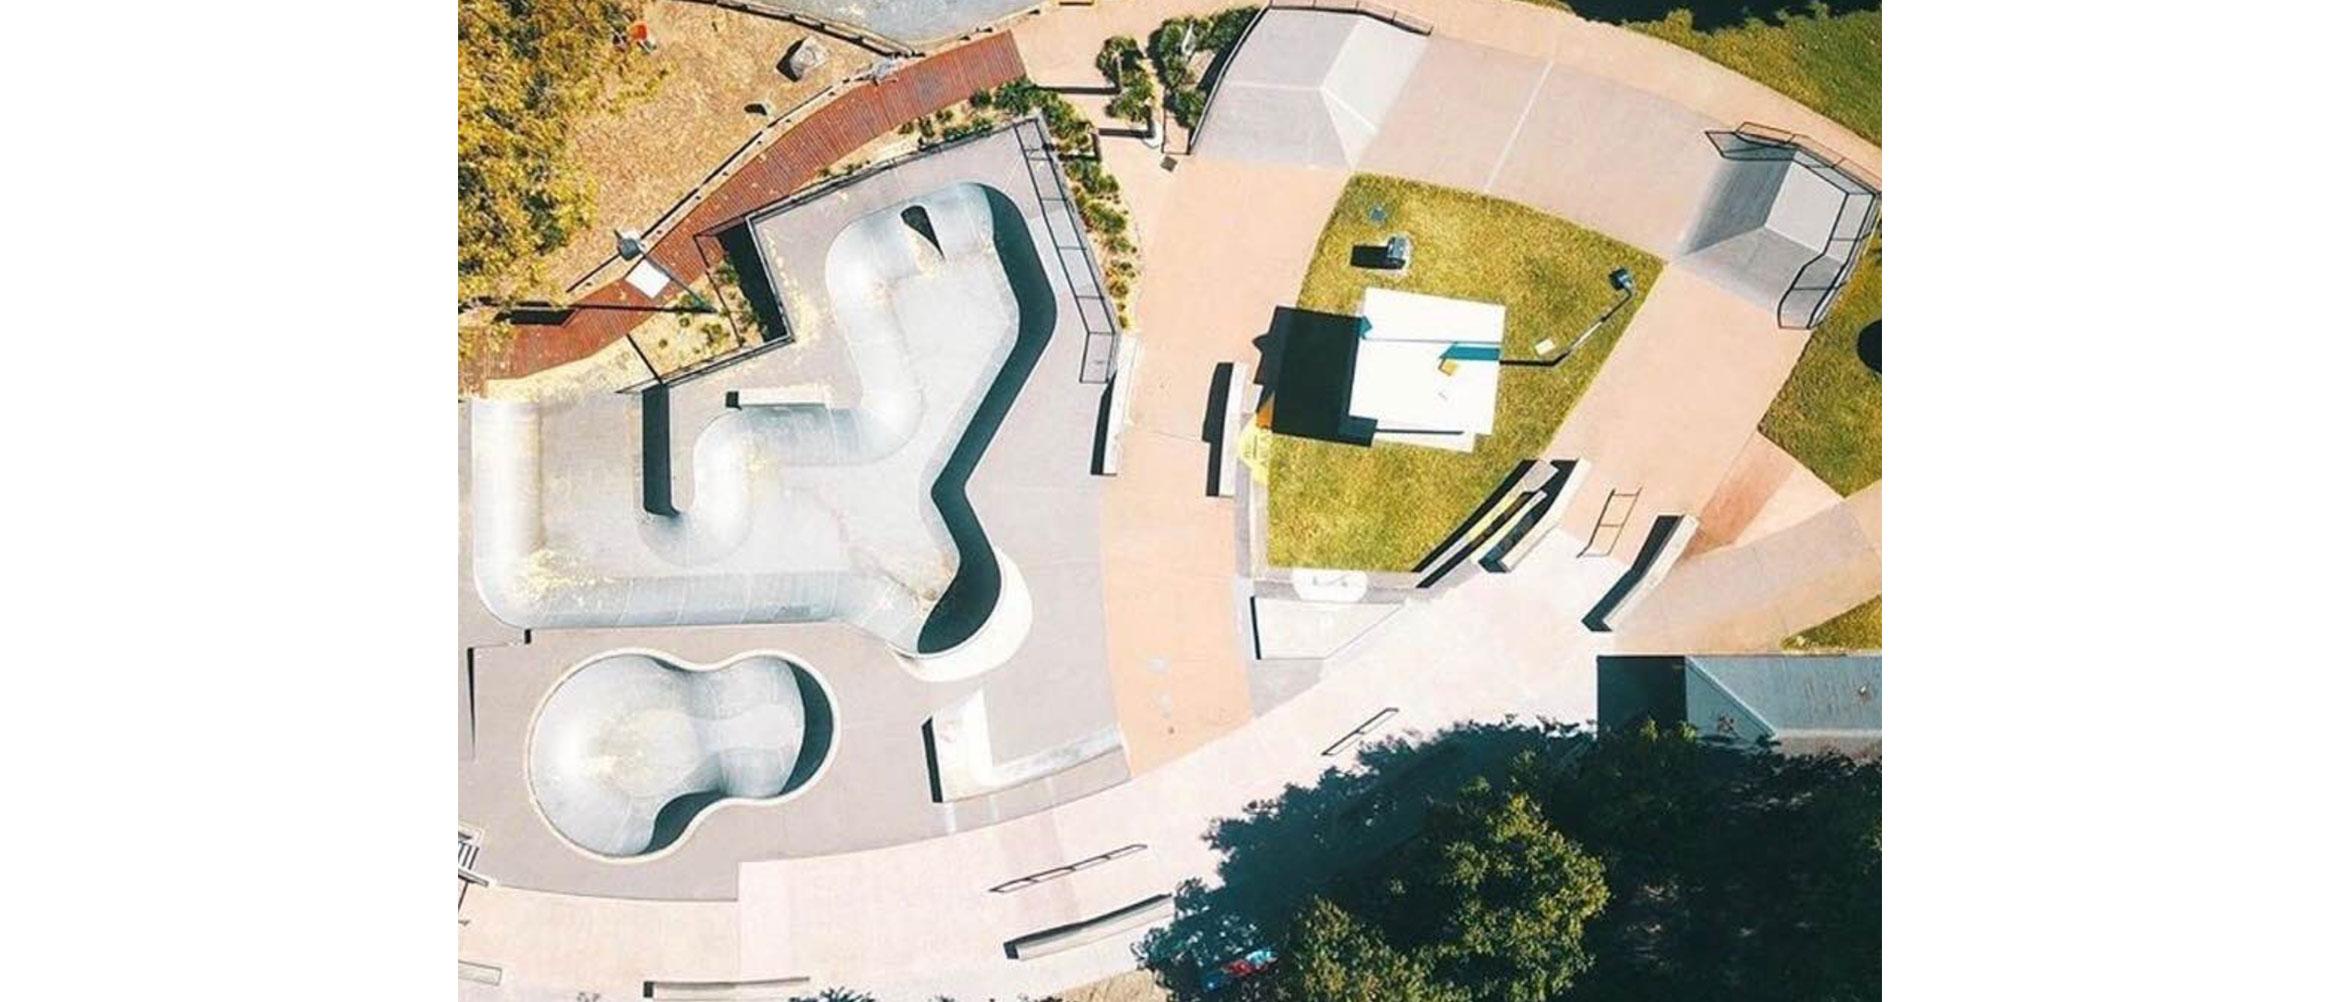 birds eye view of Nerang skate park for Concrete Skateparks portfolio